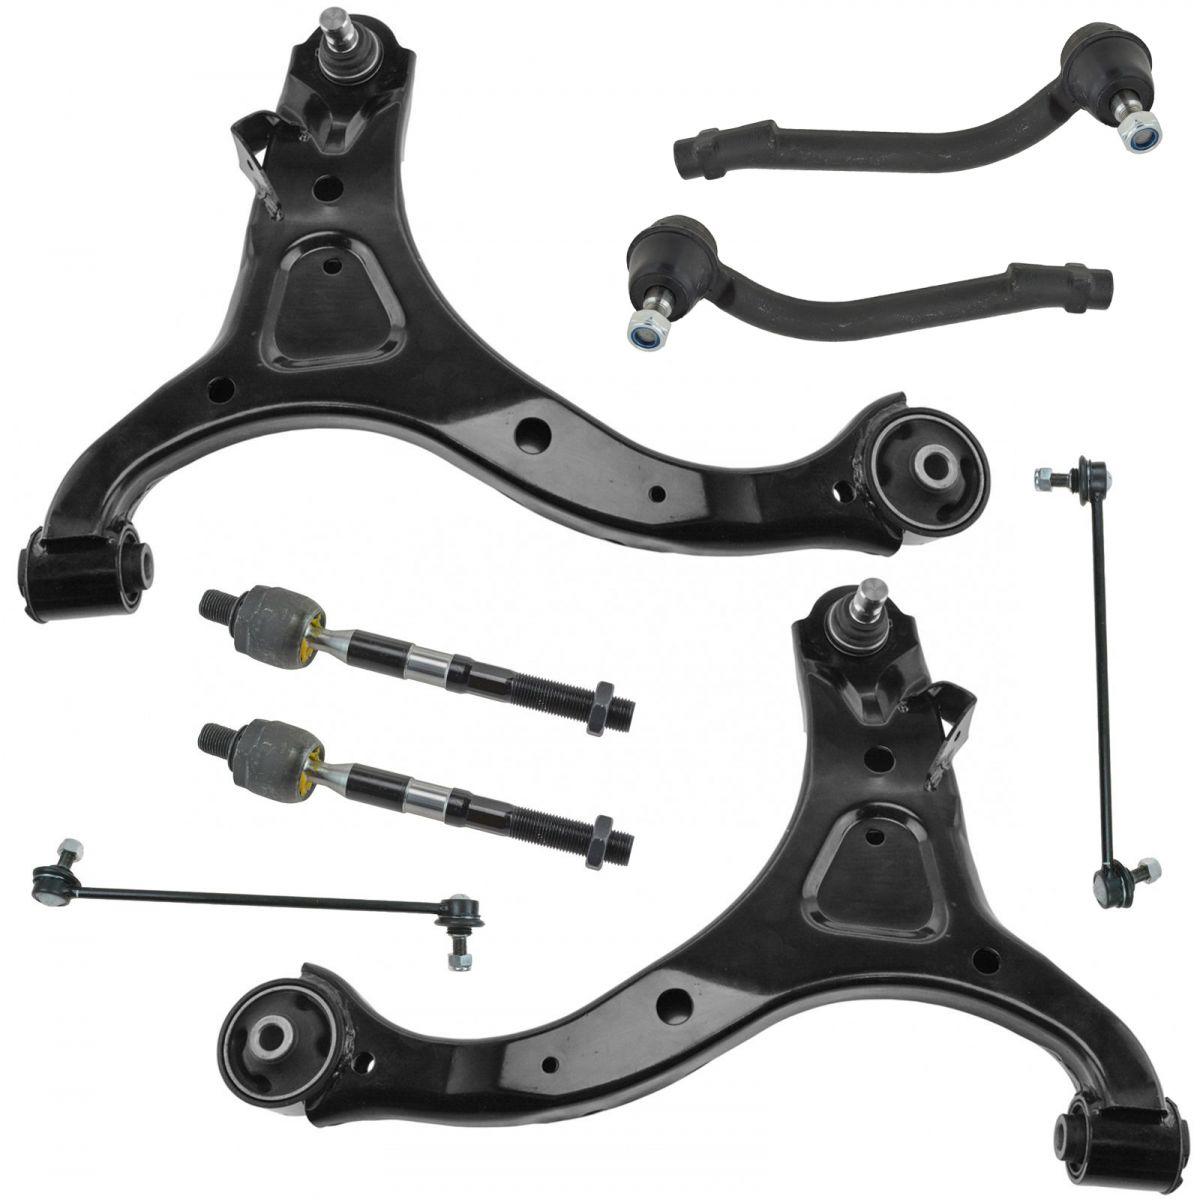 Frt Control Arms with Ball Joint Tie Rods Fits Hyundai Santa Fe Kia Sorento 8Pc